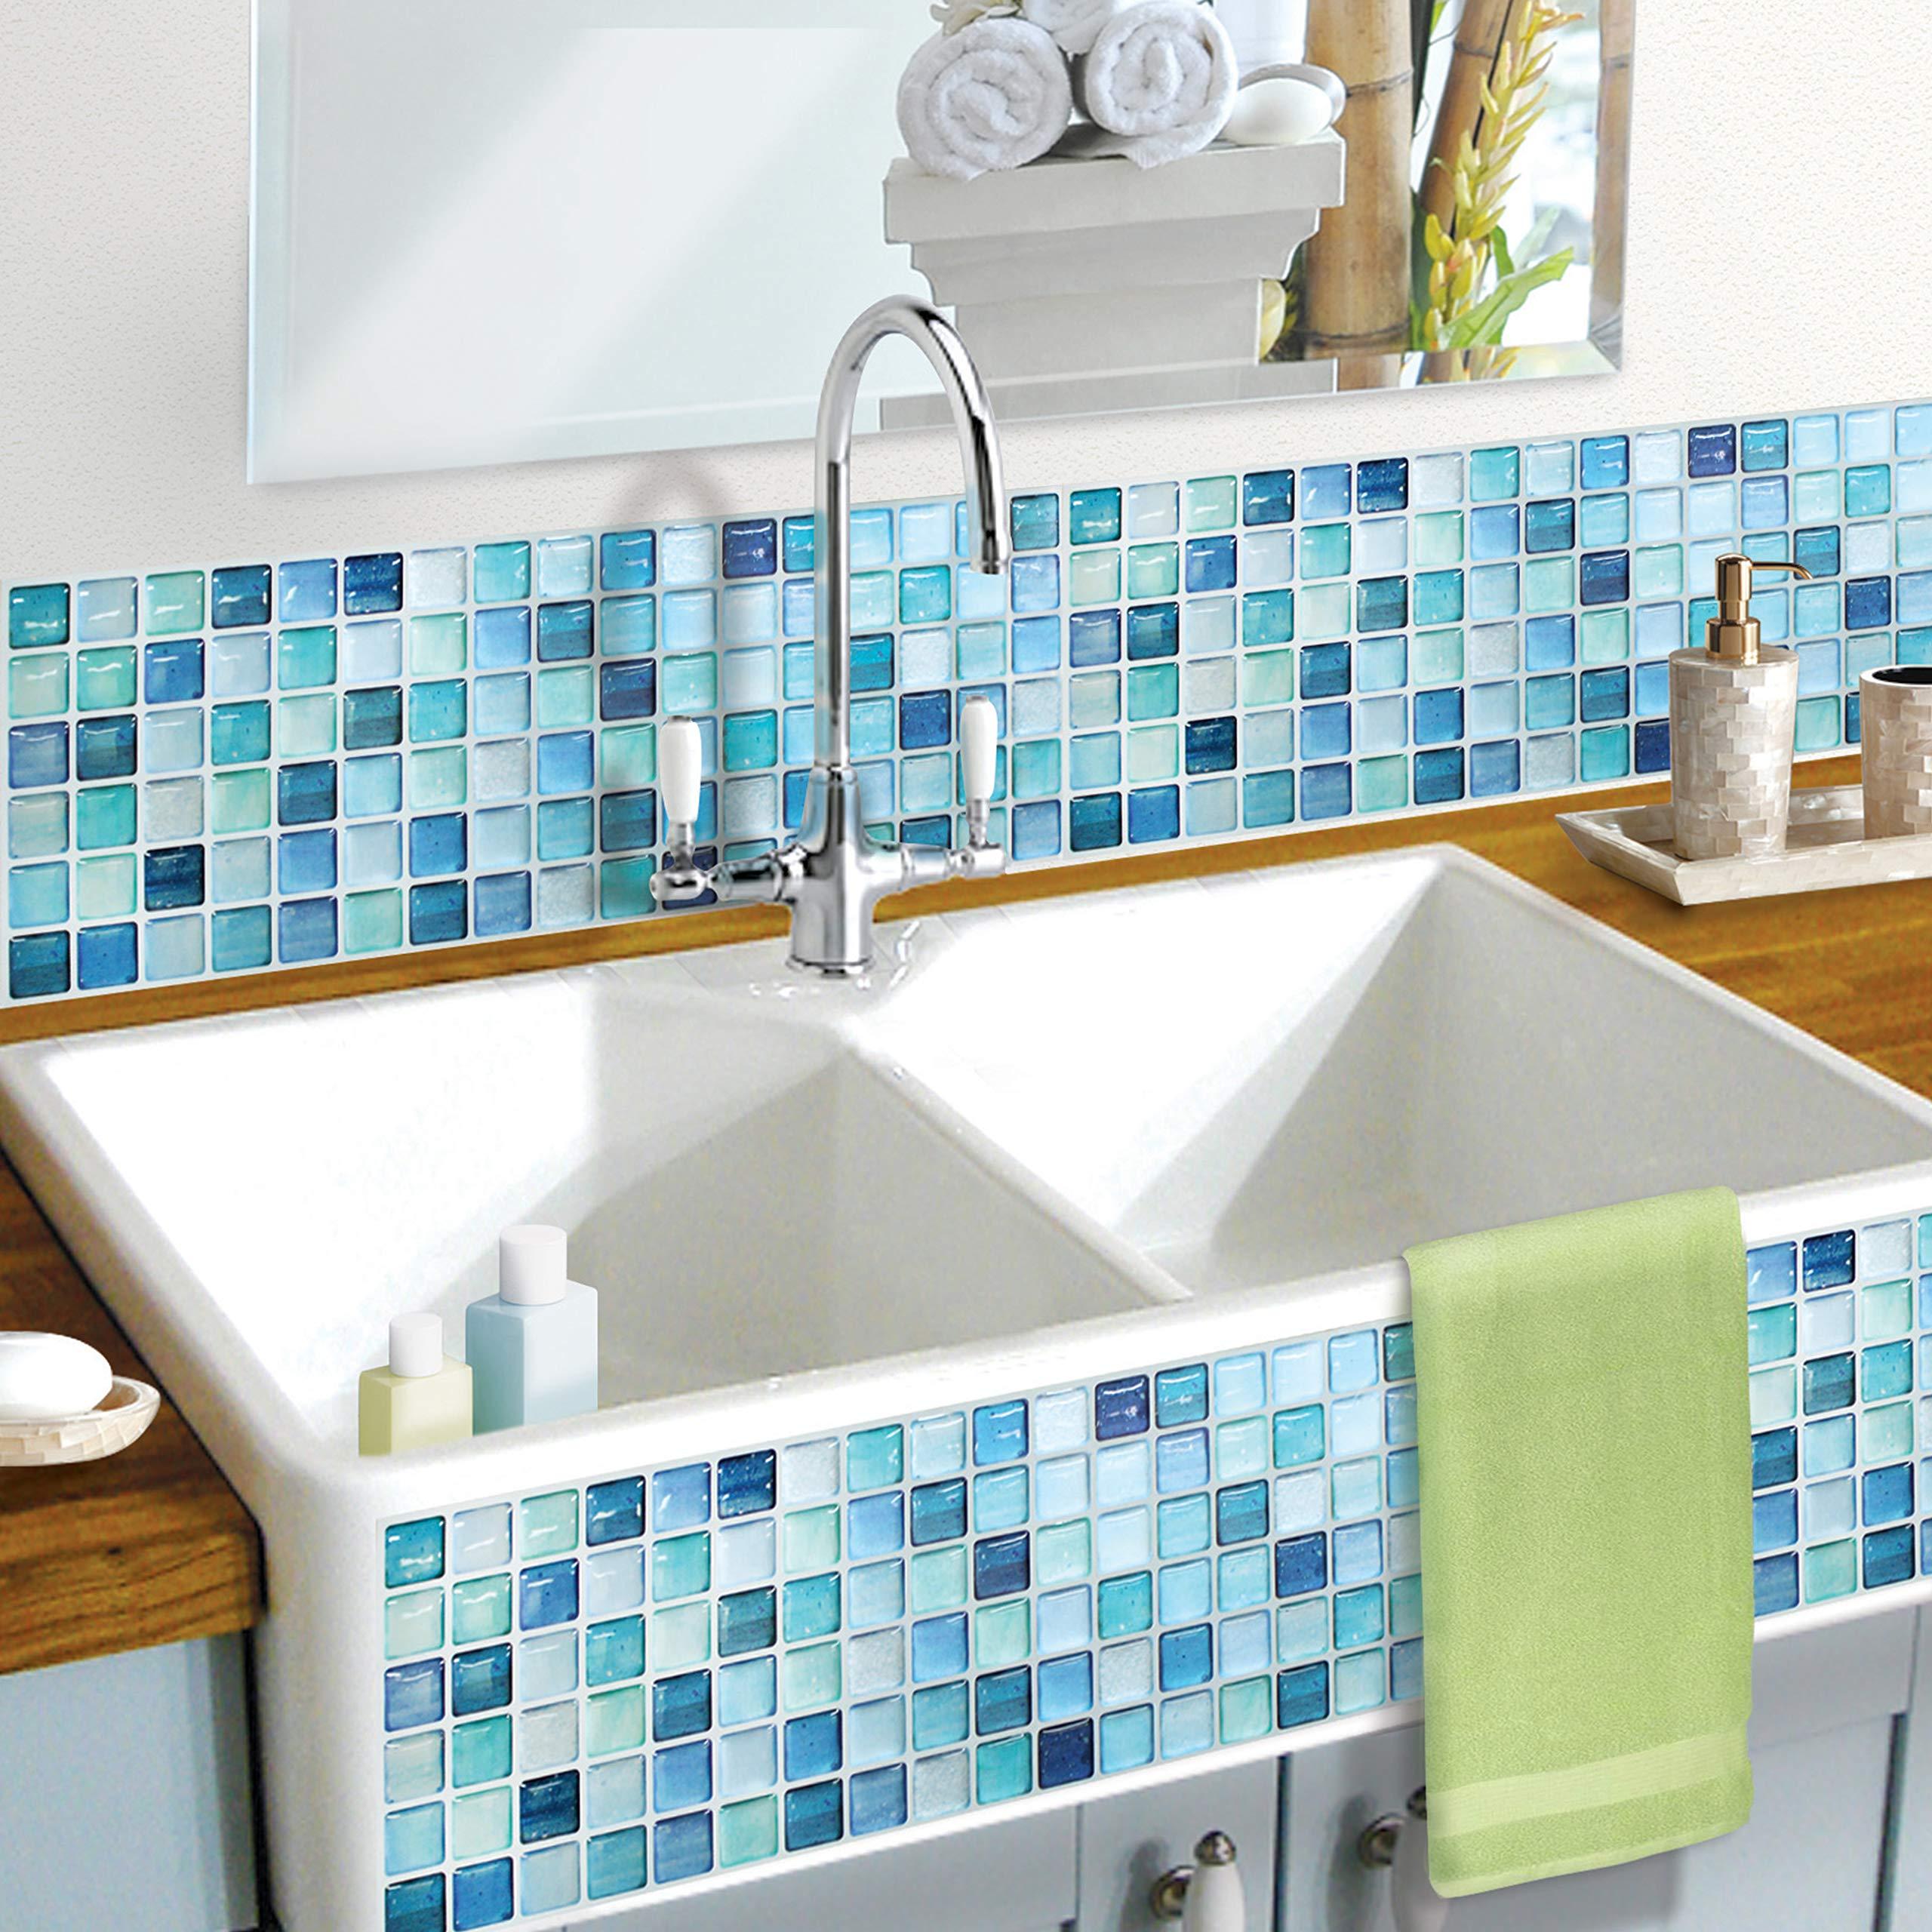 BEAUSTILE Decorative Tile Stickers Peel and Stick Backsplash Fire Retardant Tile Sheet (N.Blue) (10, 5.28'' x 14.8'') by BEAUS TILE (Image #7)